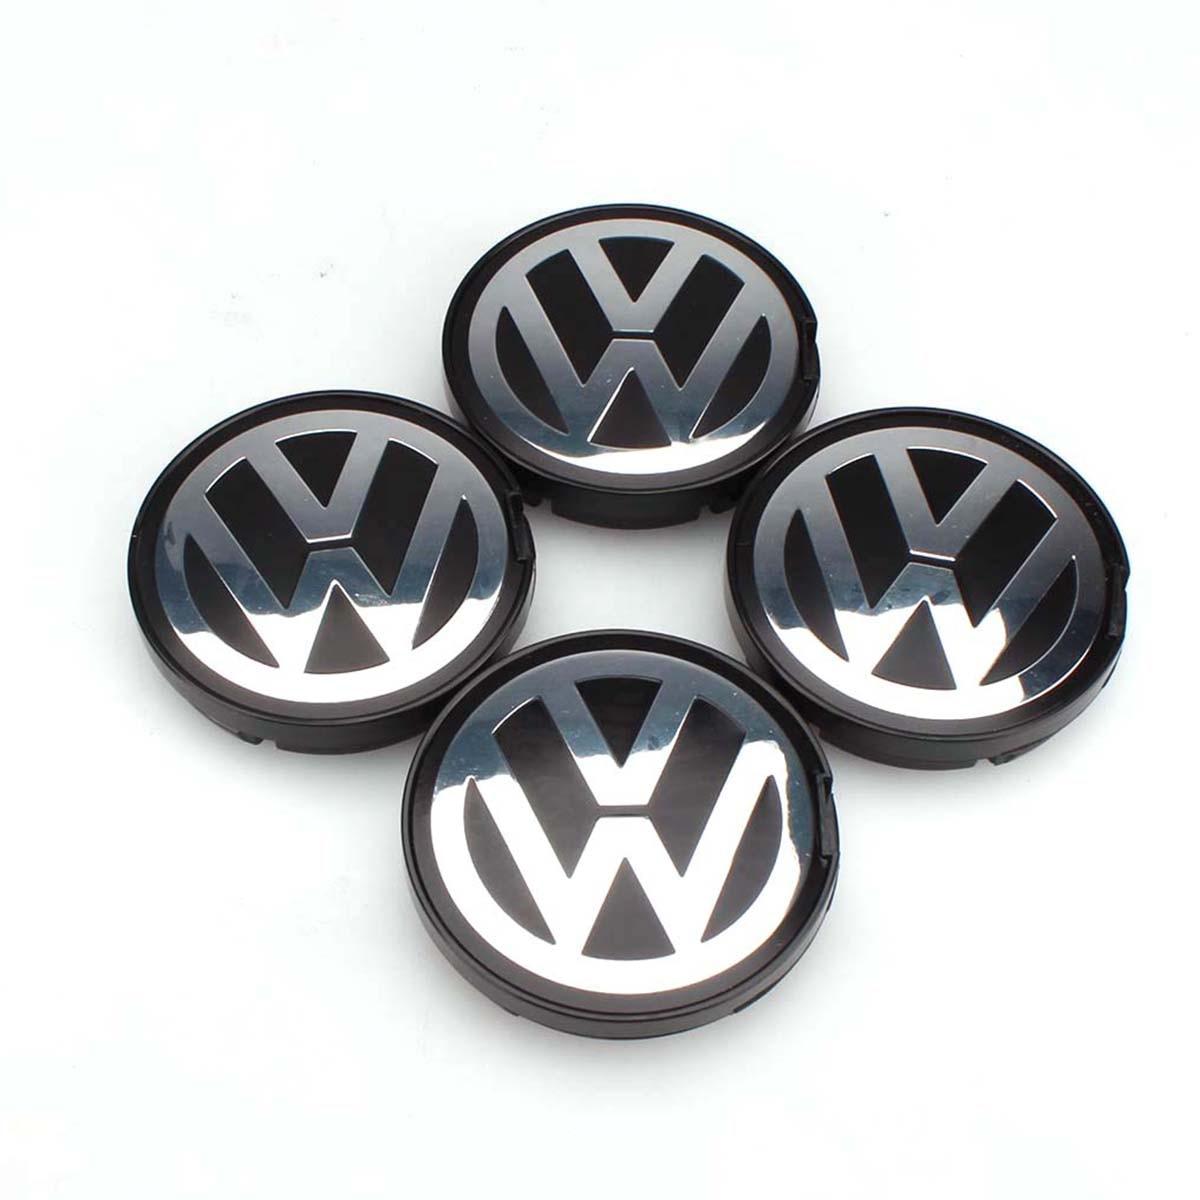 OEM Hub Logo Emblem 55mm Wheel Center Cap Cover for VW Golf Jetta Passat GTI R32 Bora 6N0 601 171